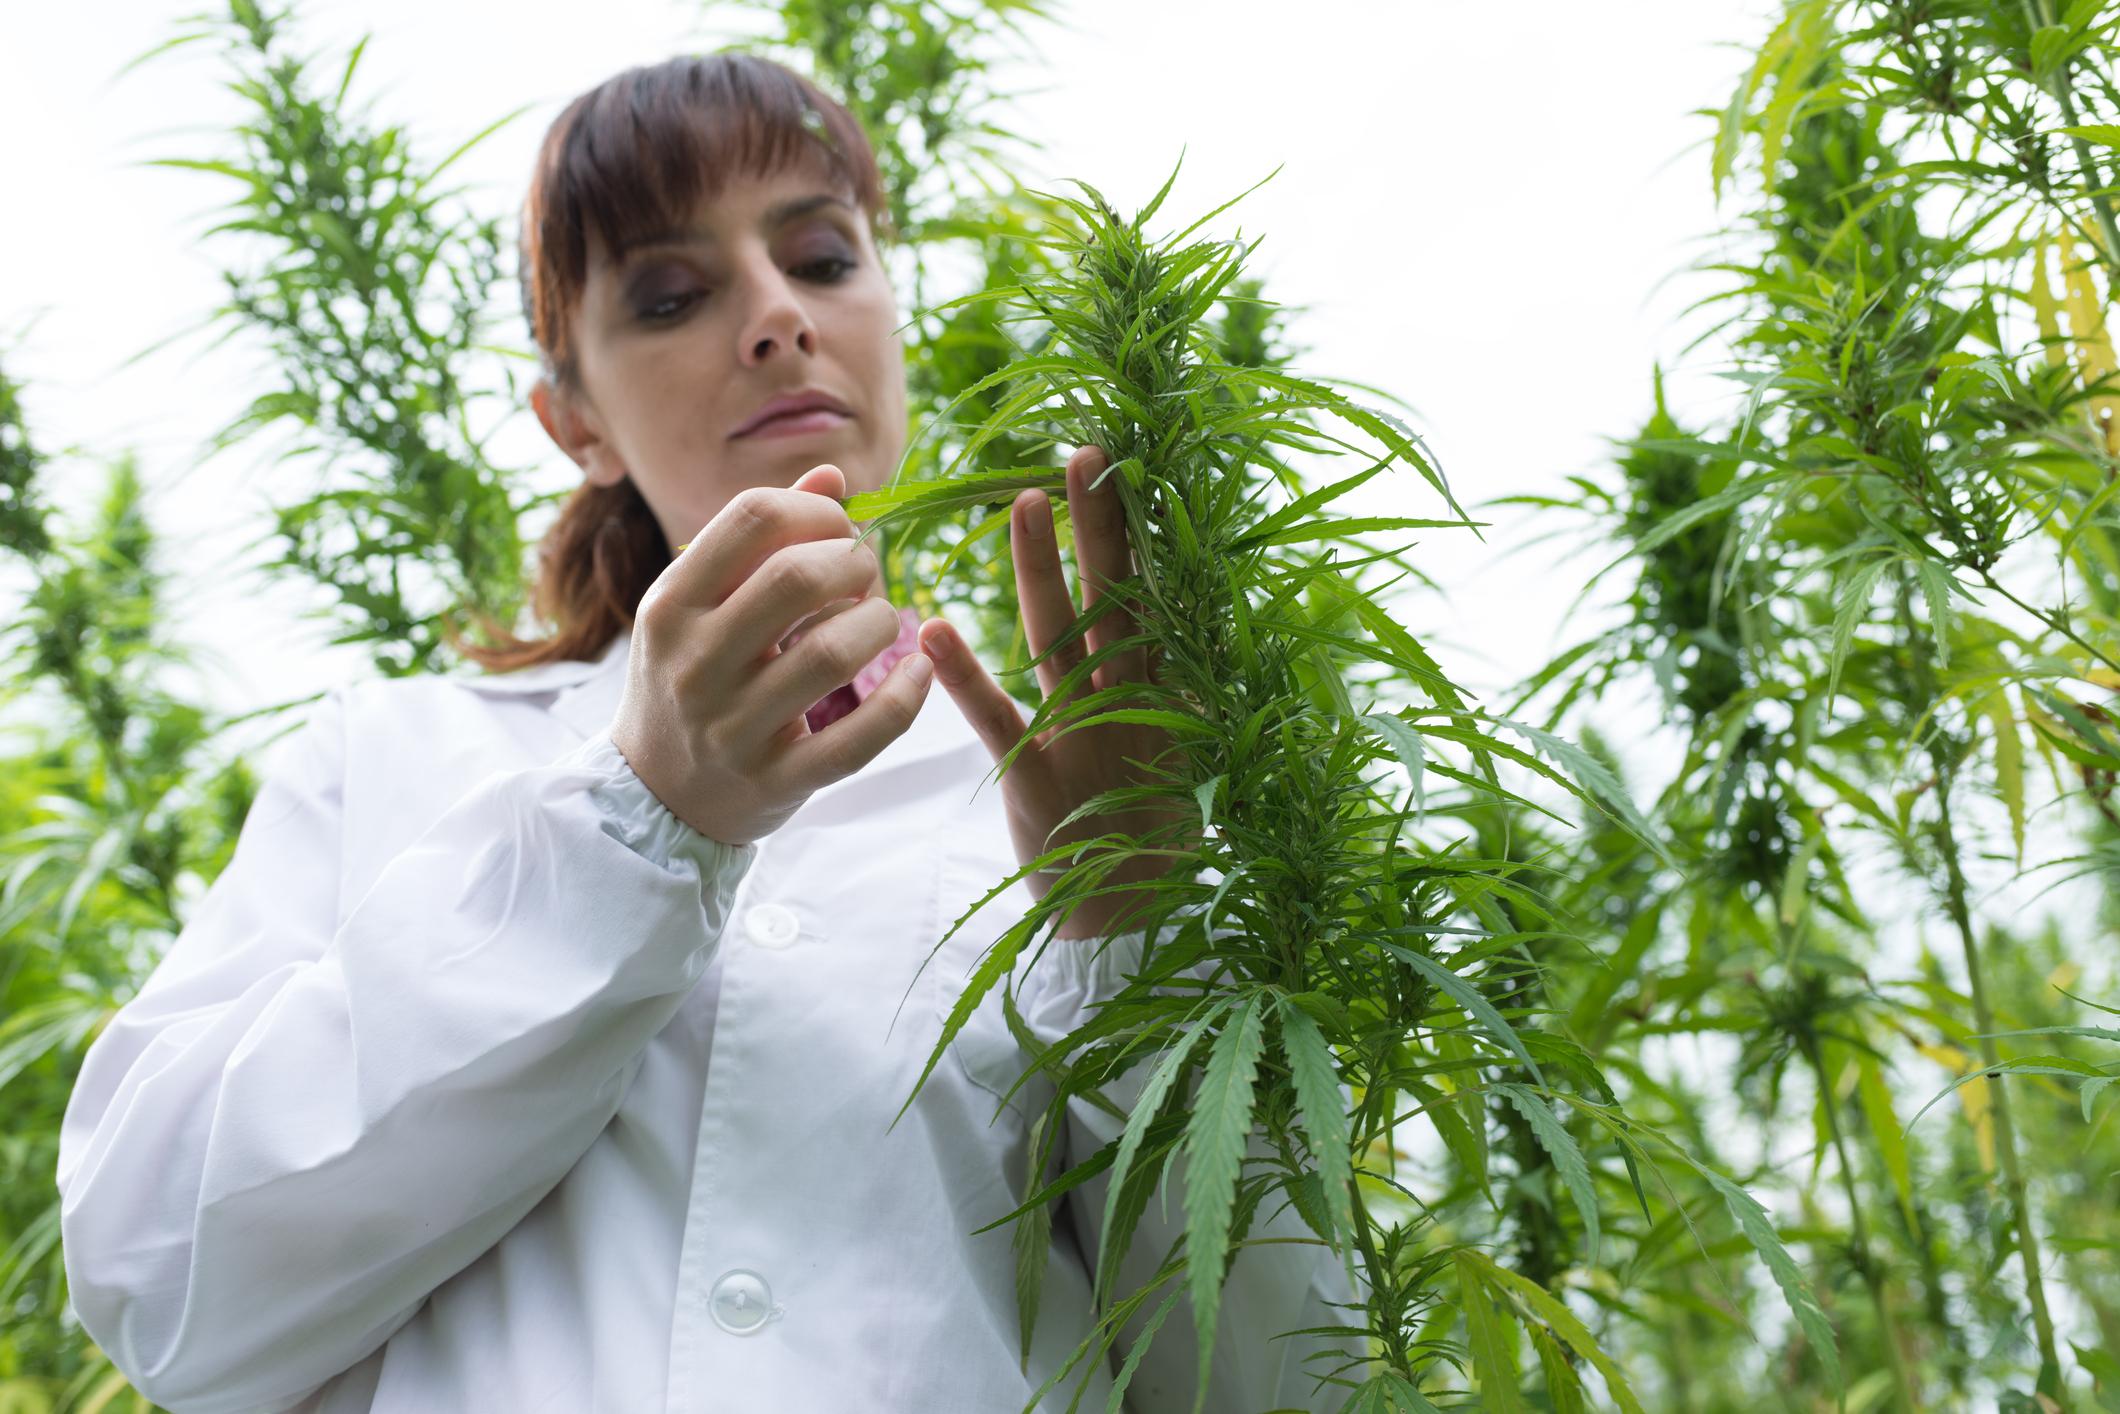 A woman trims a marijuana plant.